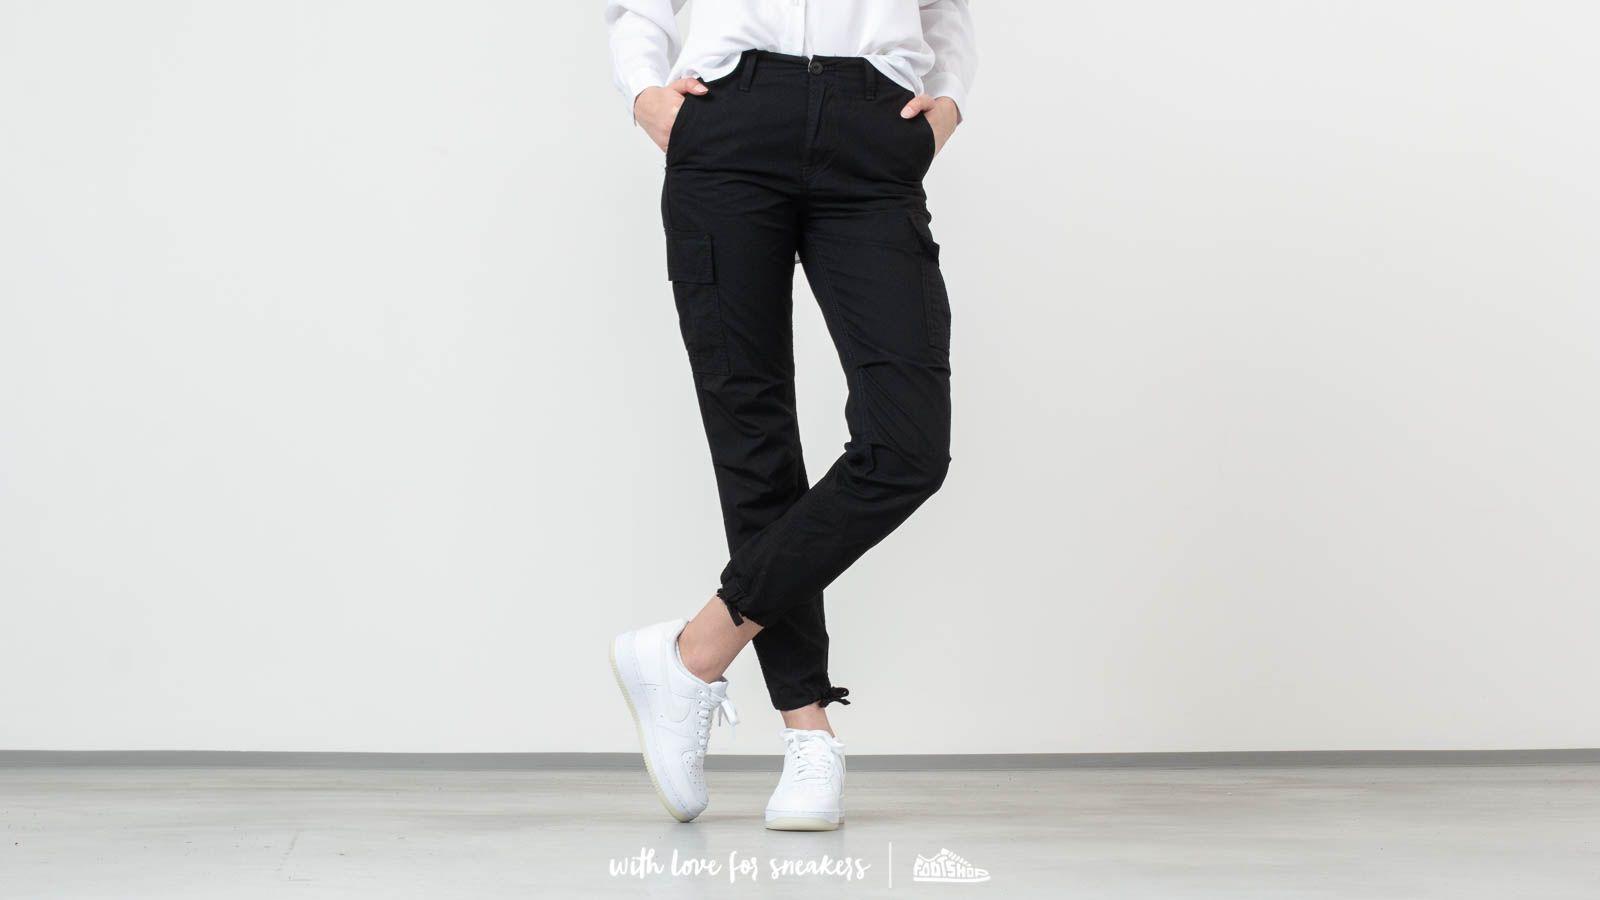 Carhartt WIP Cymbal Pants Black Rinsed at a great price 95 € buy at Footshop